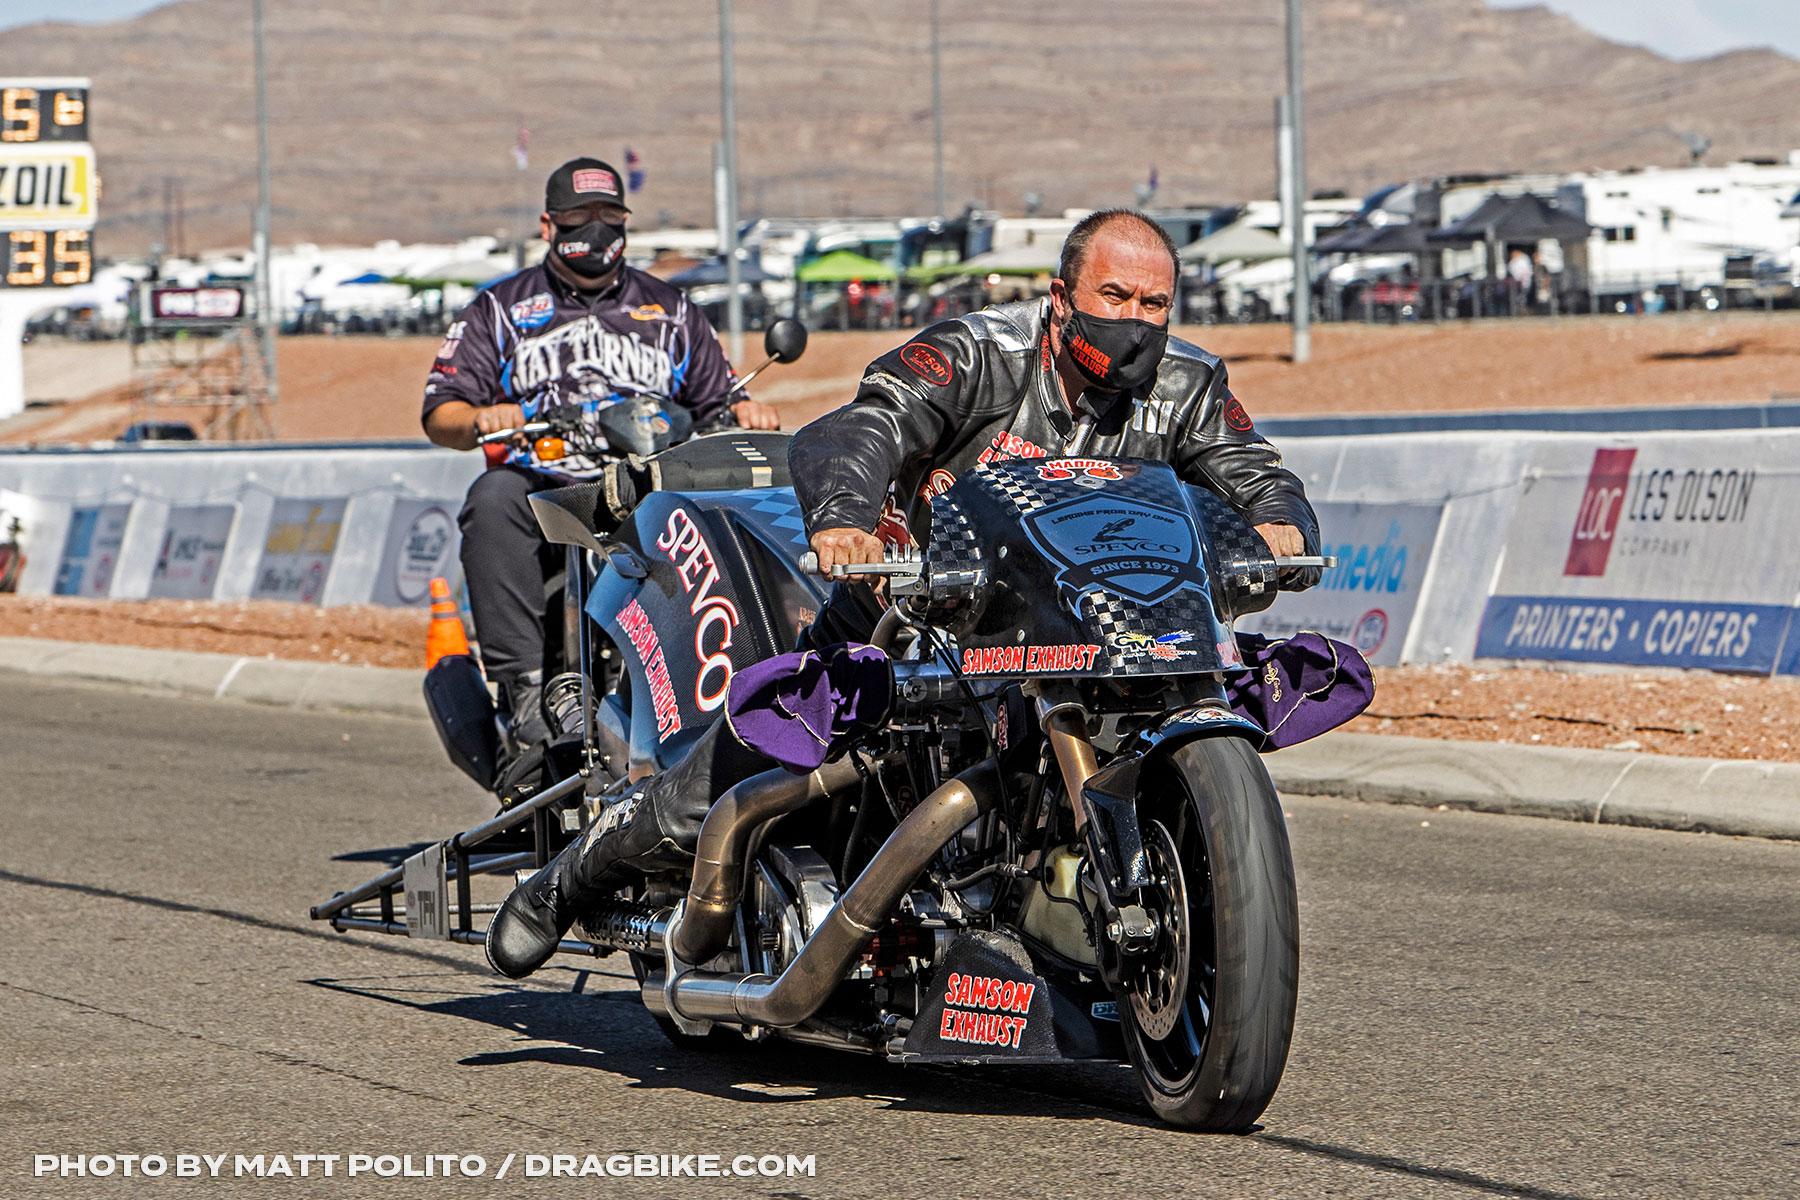 Tii Tharpe - NHRA Top Fuel Harley